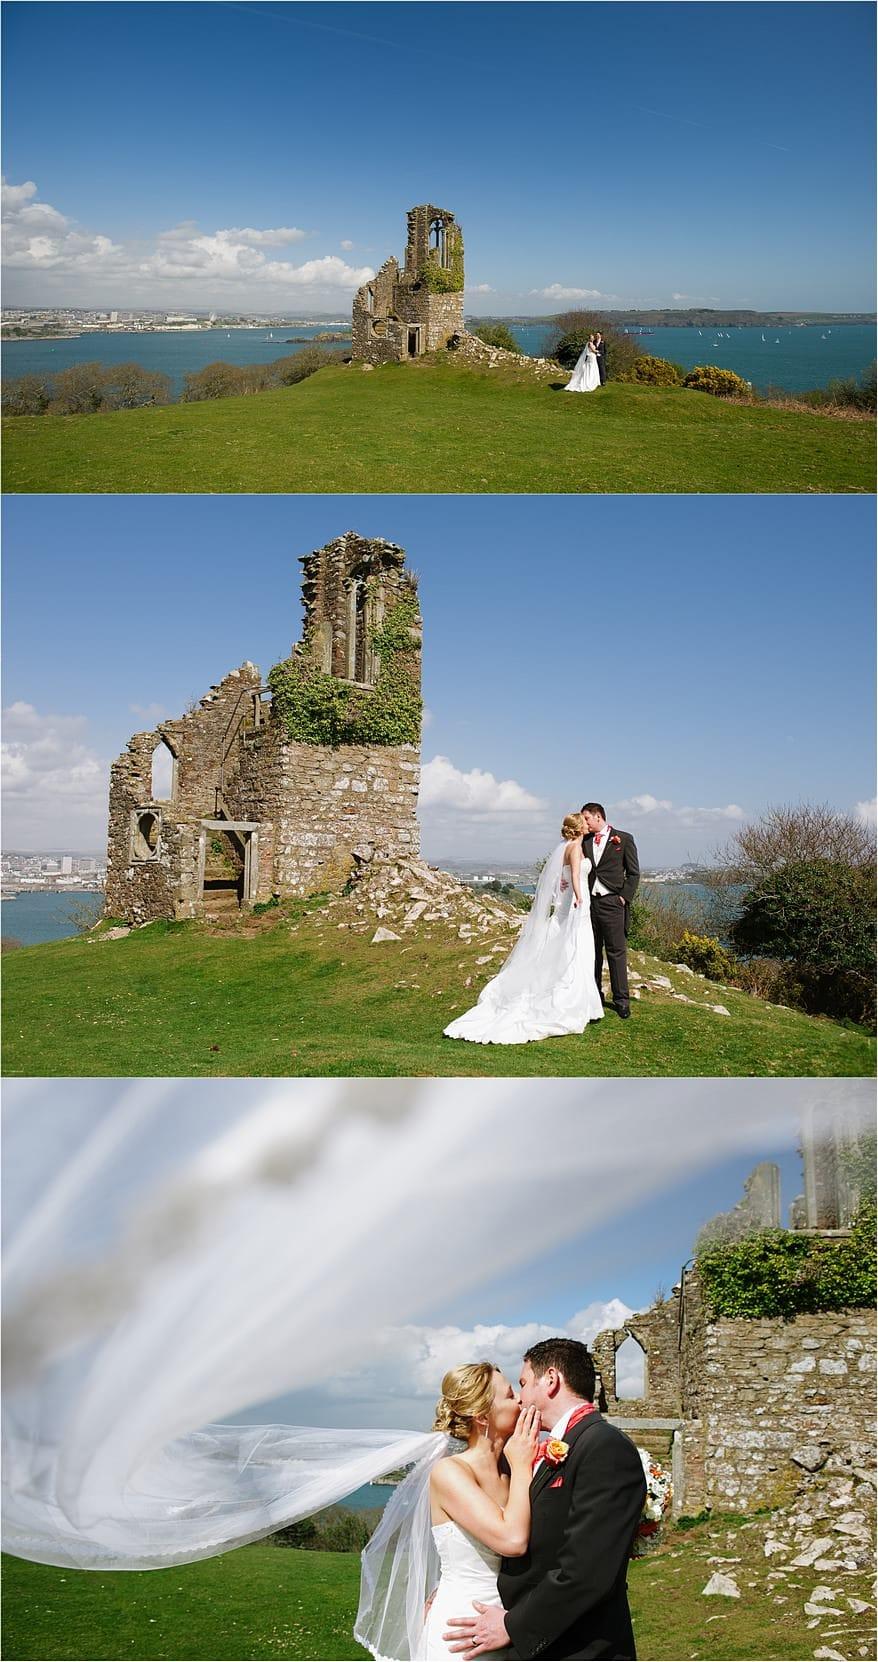 mount edgcumbe wedding 3 wedding at mount edgcumbe house